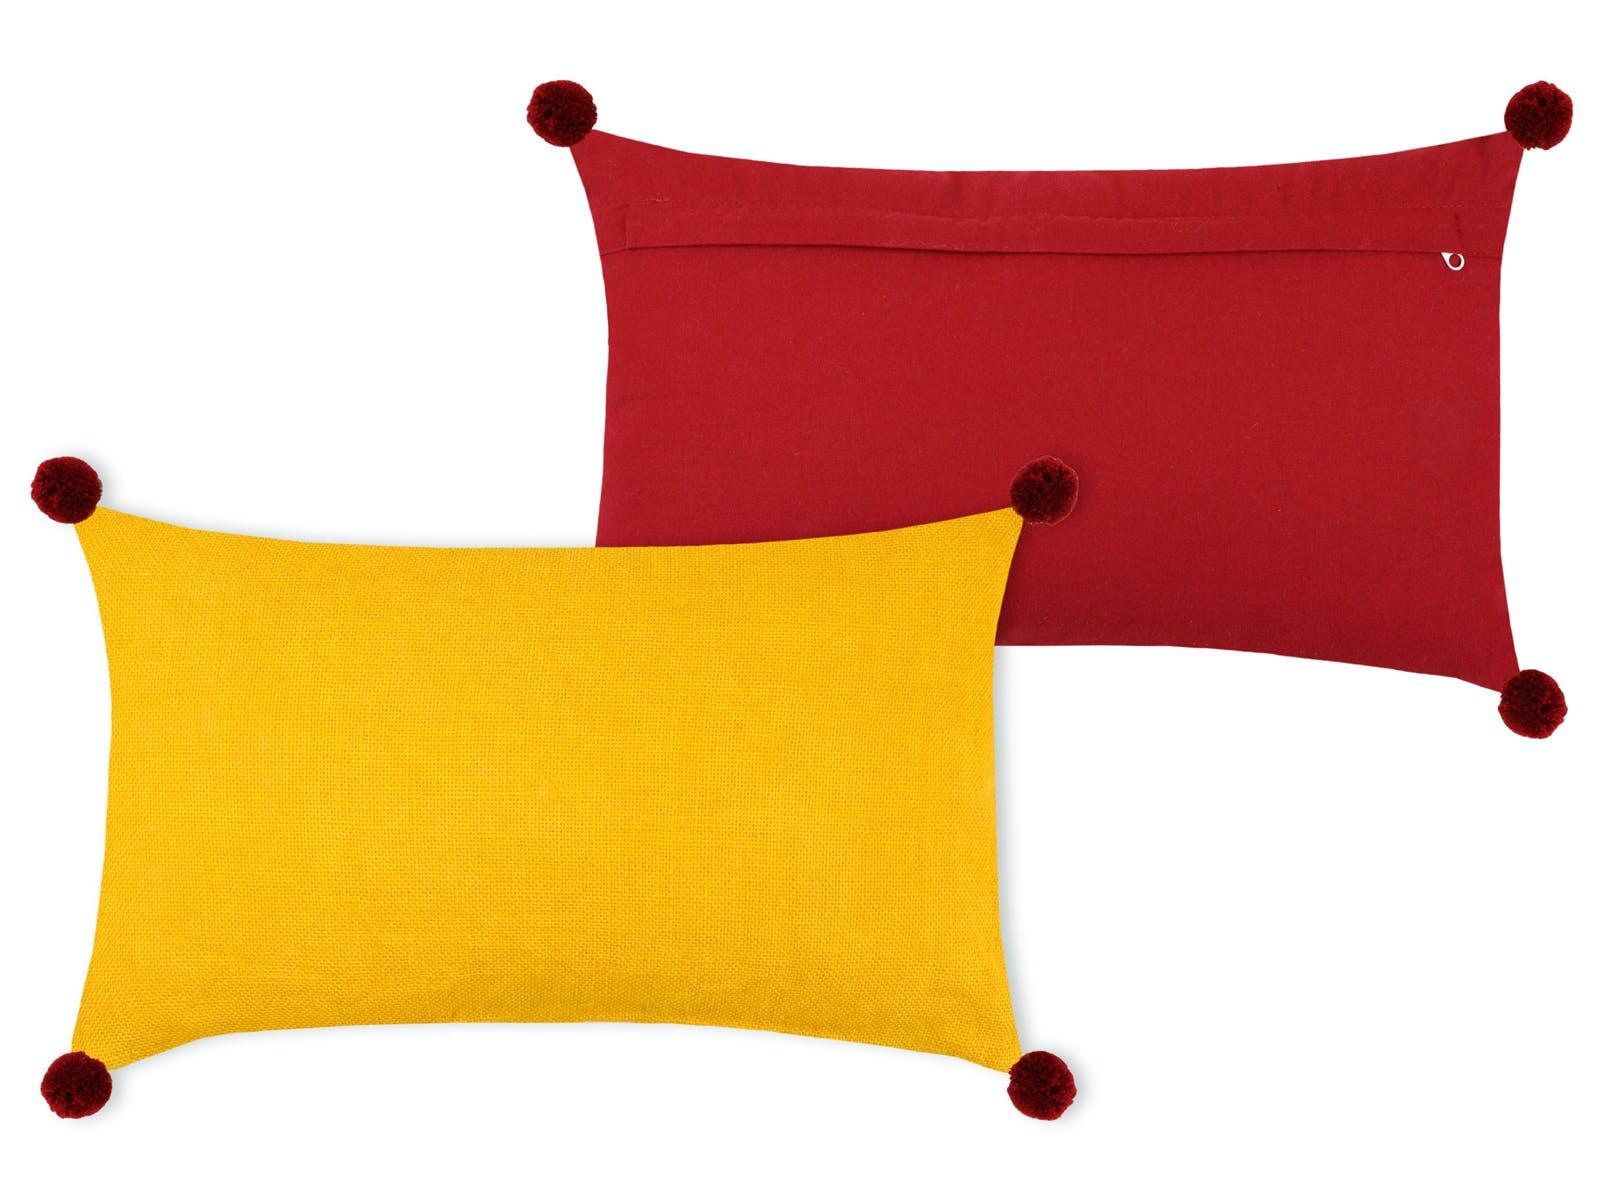 Coussin recto jaune verso rouge 30x50cm PUNO